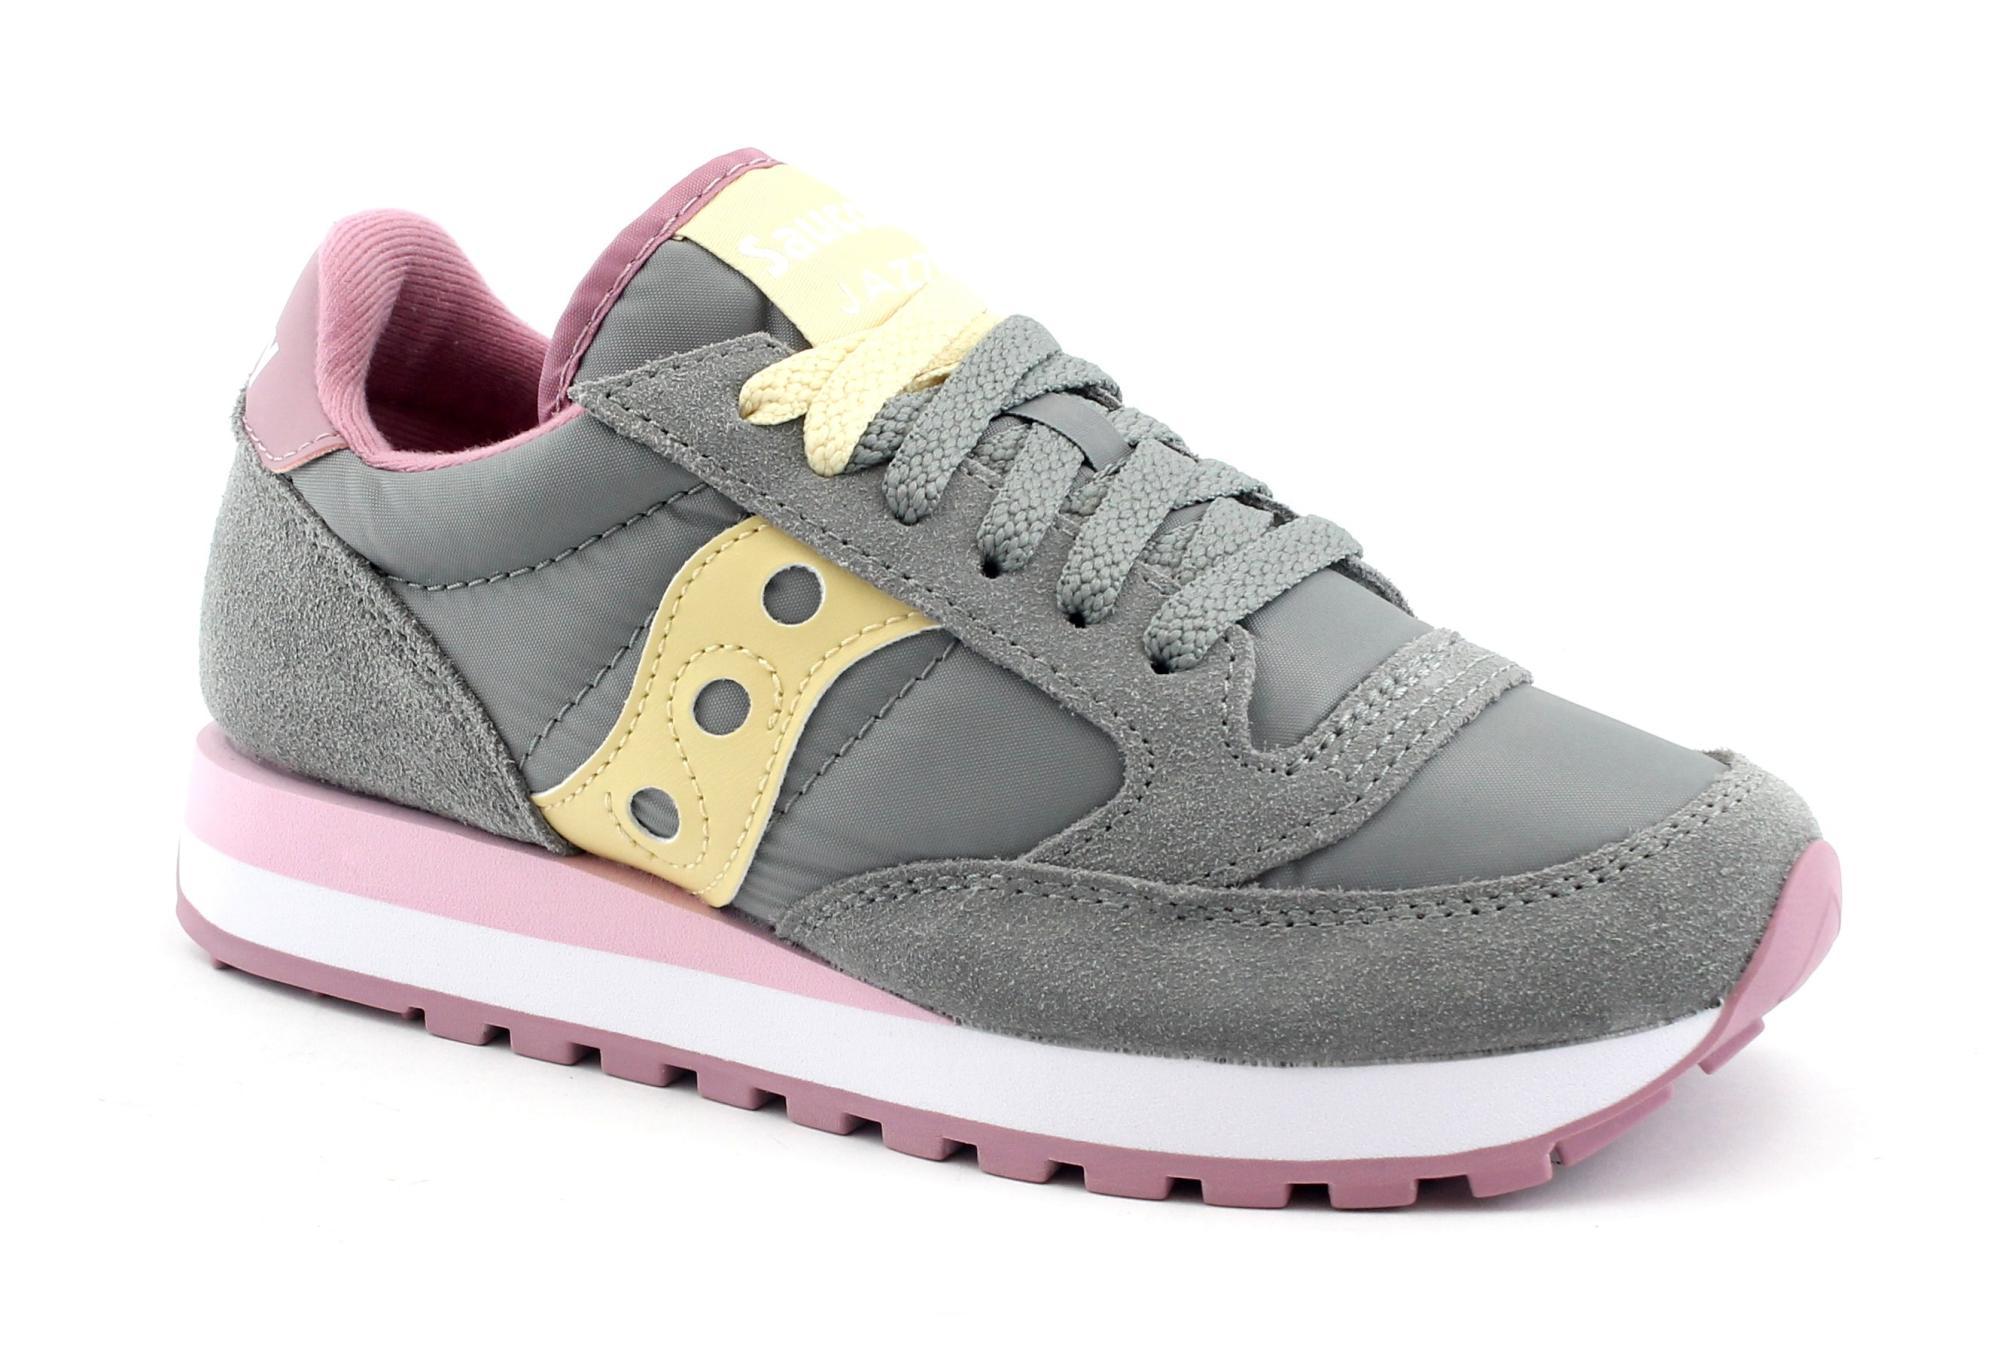 SAUCONY S1044-515 JAZZ ORIGINAL grigio rosa scarpe donna sneakers